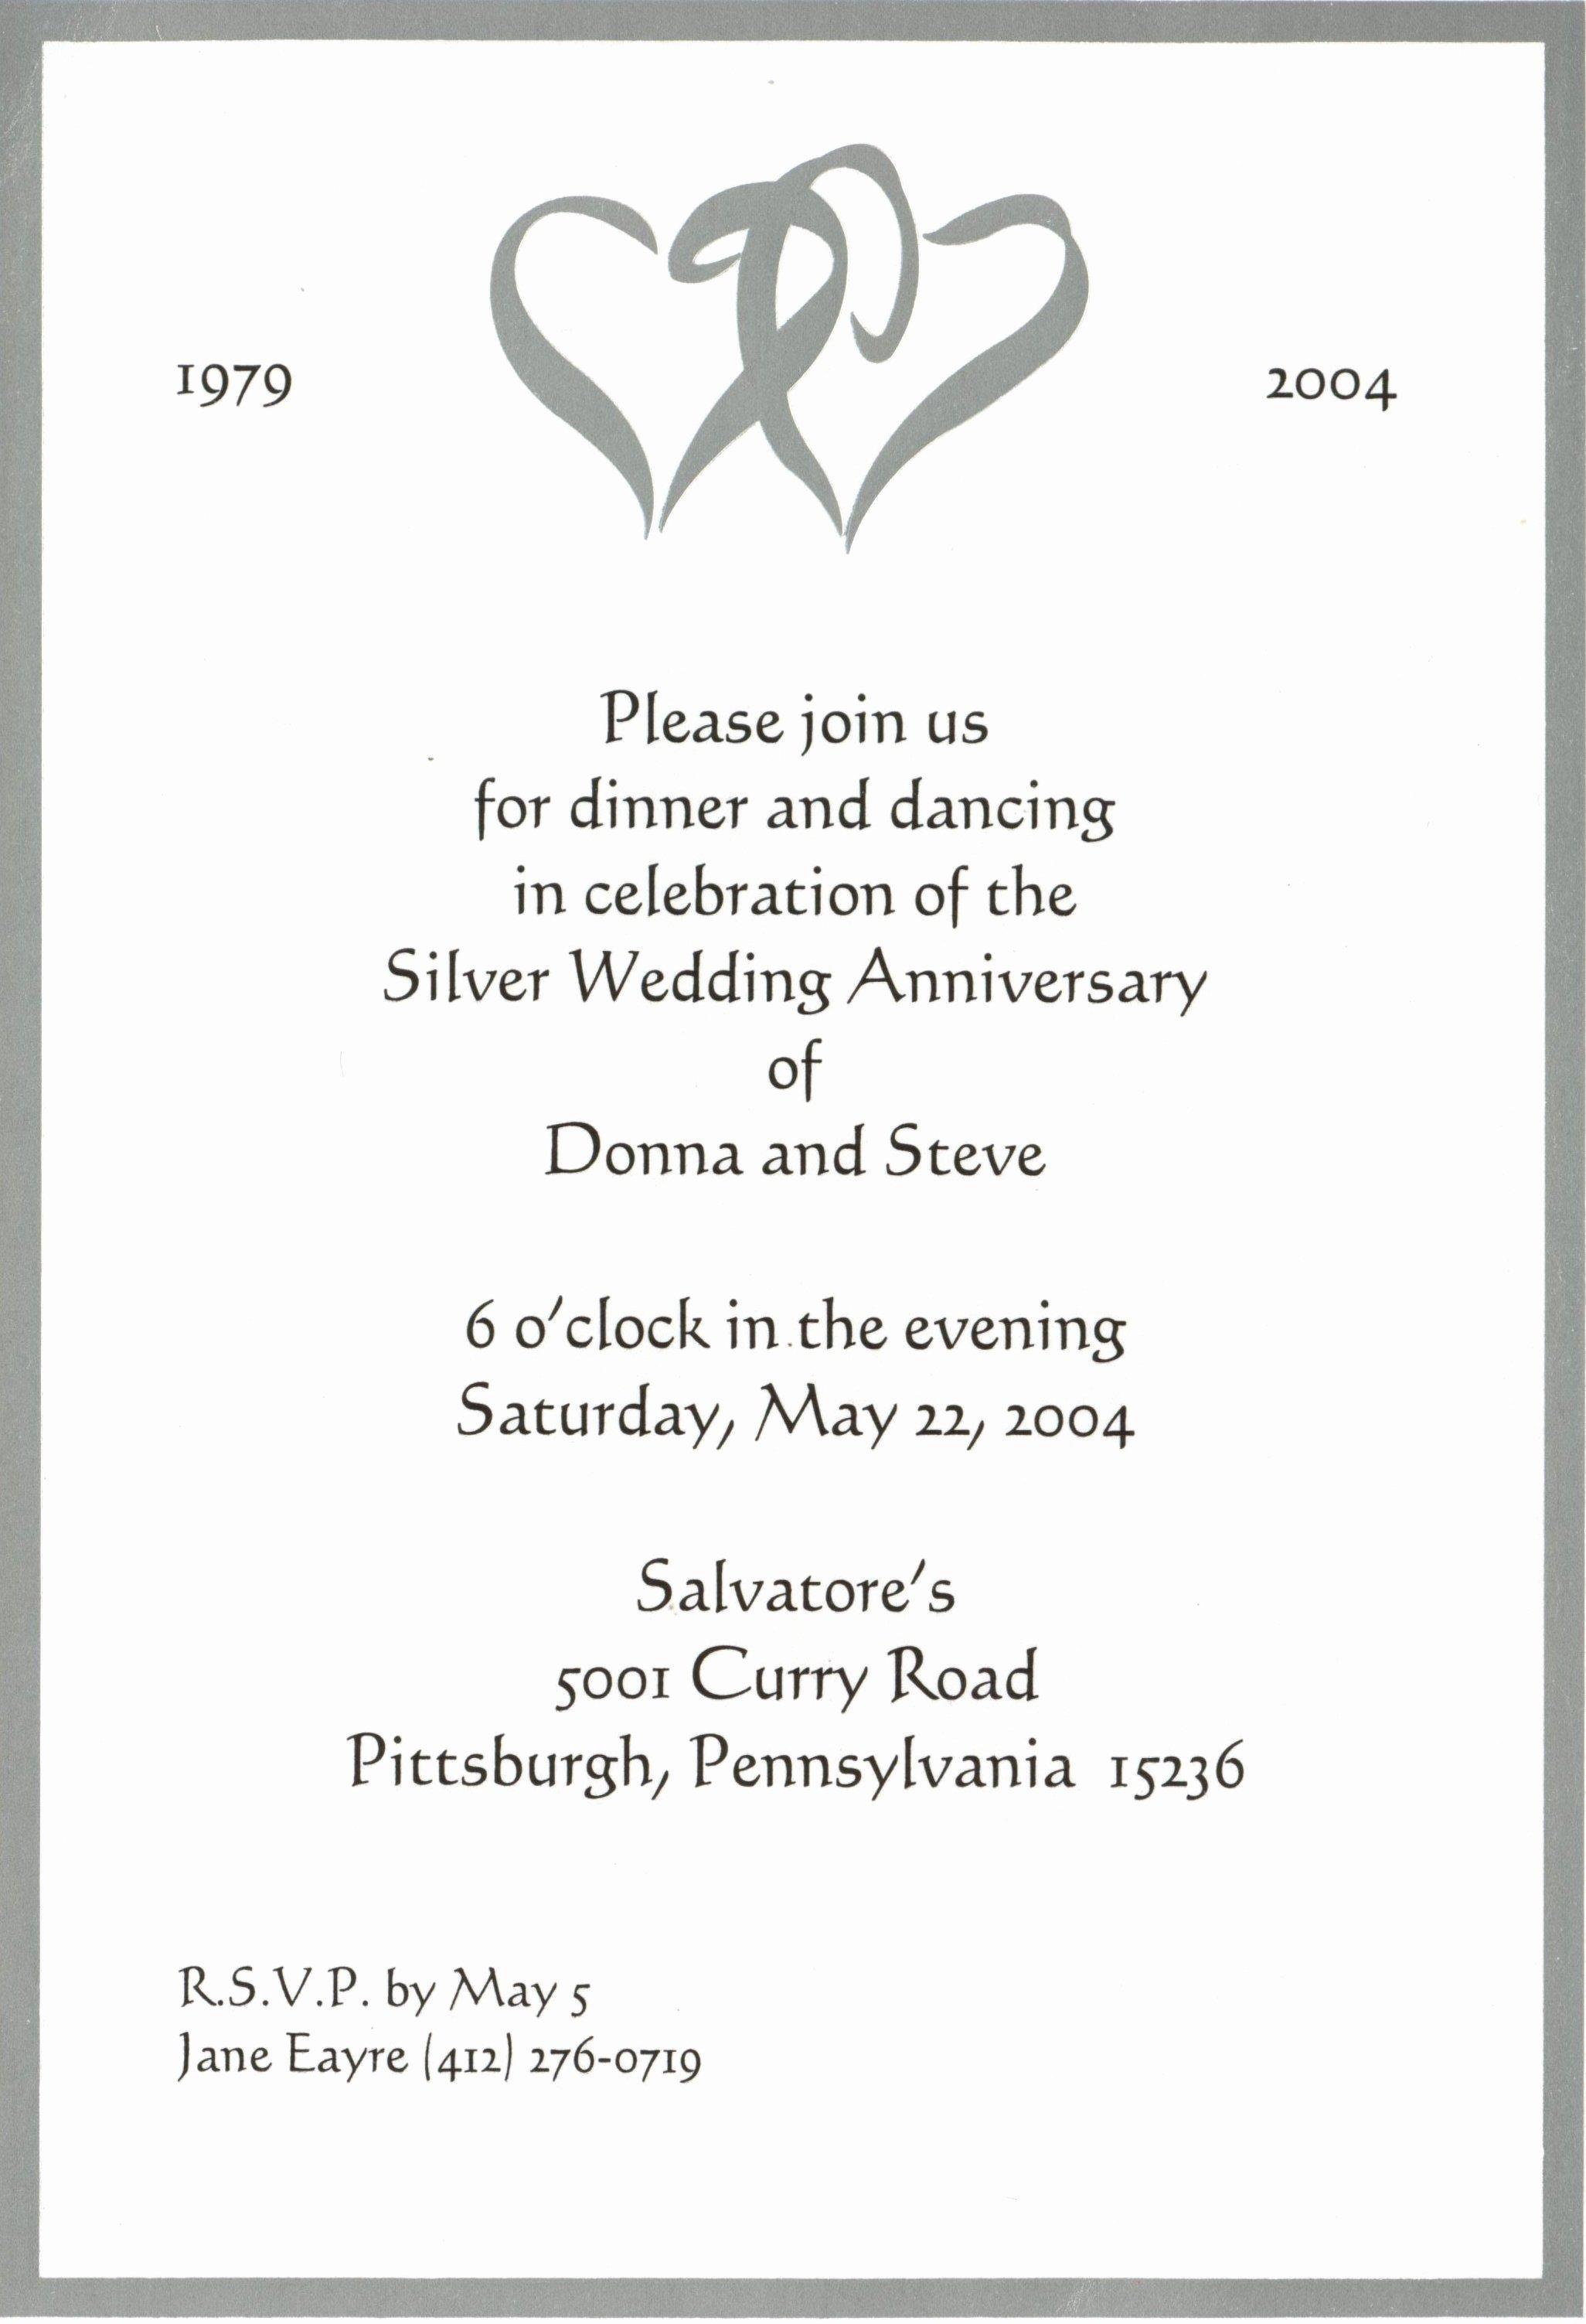 Wedding Anniversary Invite Template Fresh 50th Wedding Anniversary Invitation Templates Awesome